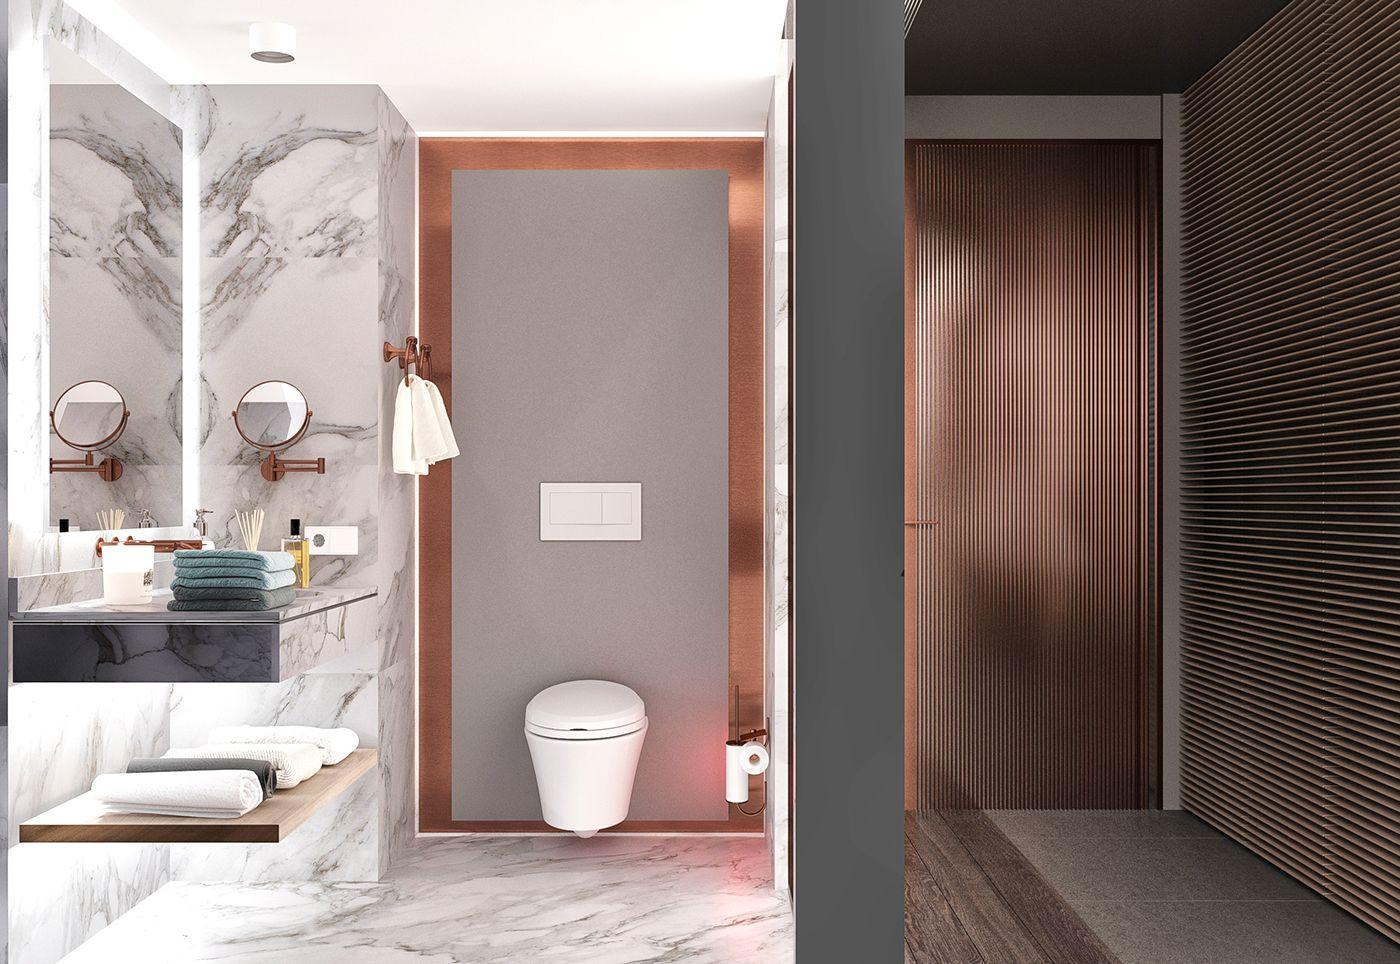 Coronarender Toilet And Bathroom Design Luxury Hotel Room Hotels Room